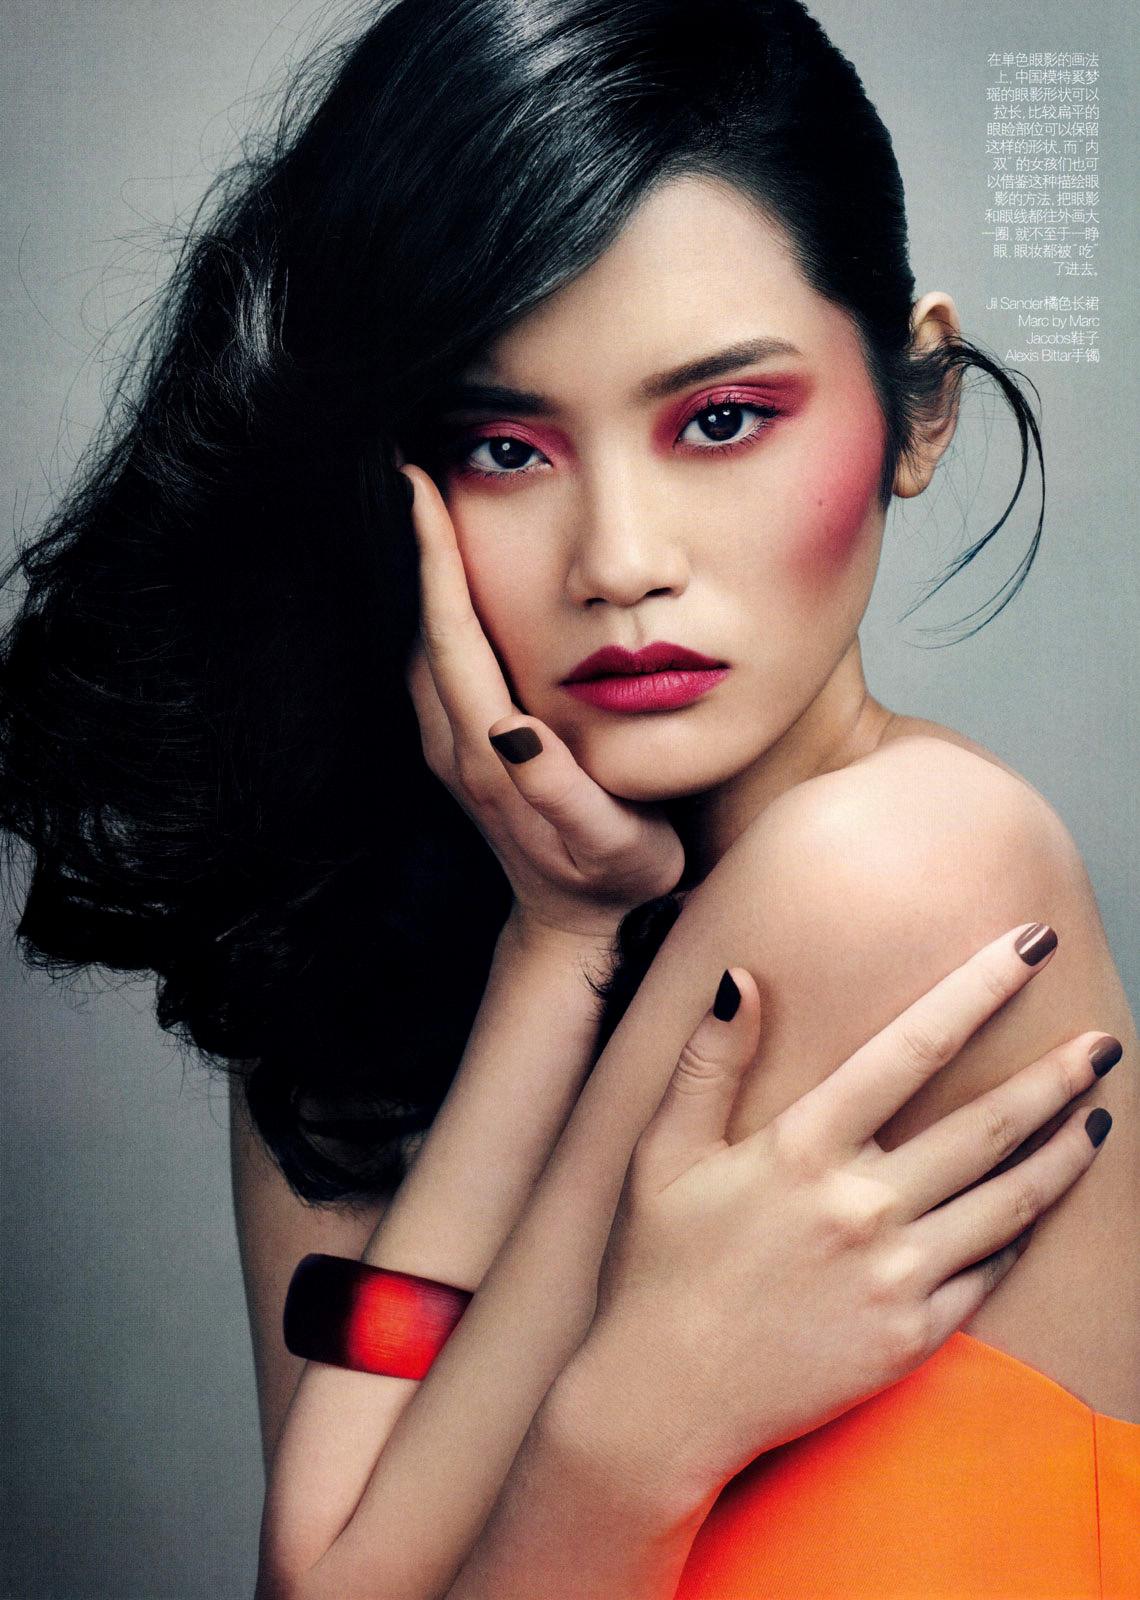 ASIAN MODELS BLOG: EDITORIAL: Ming Xi In Vogue China